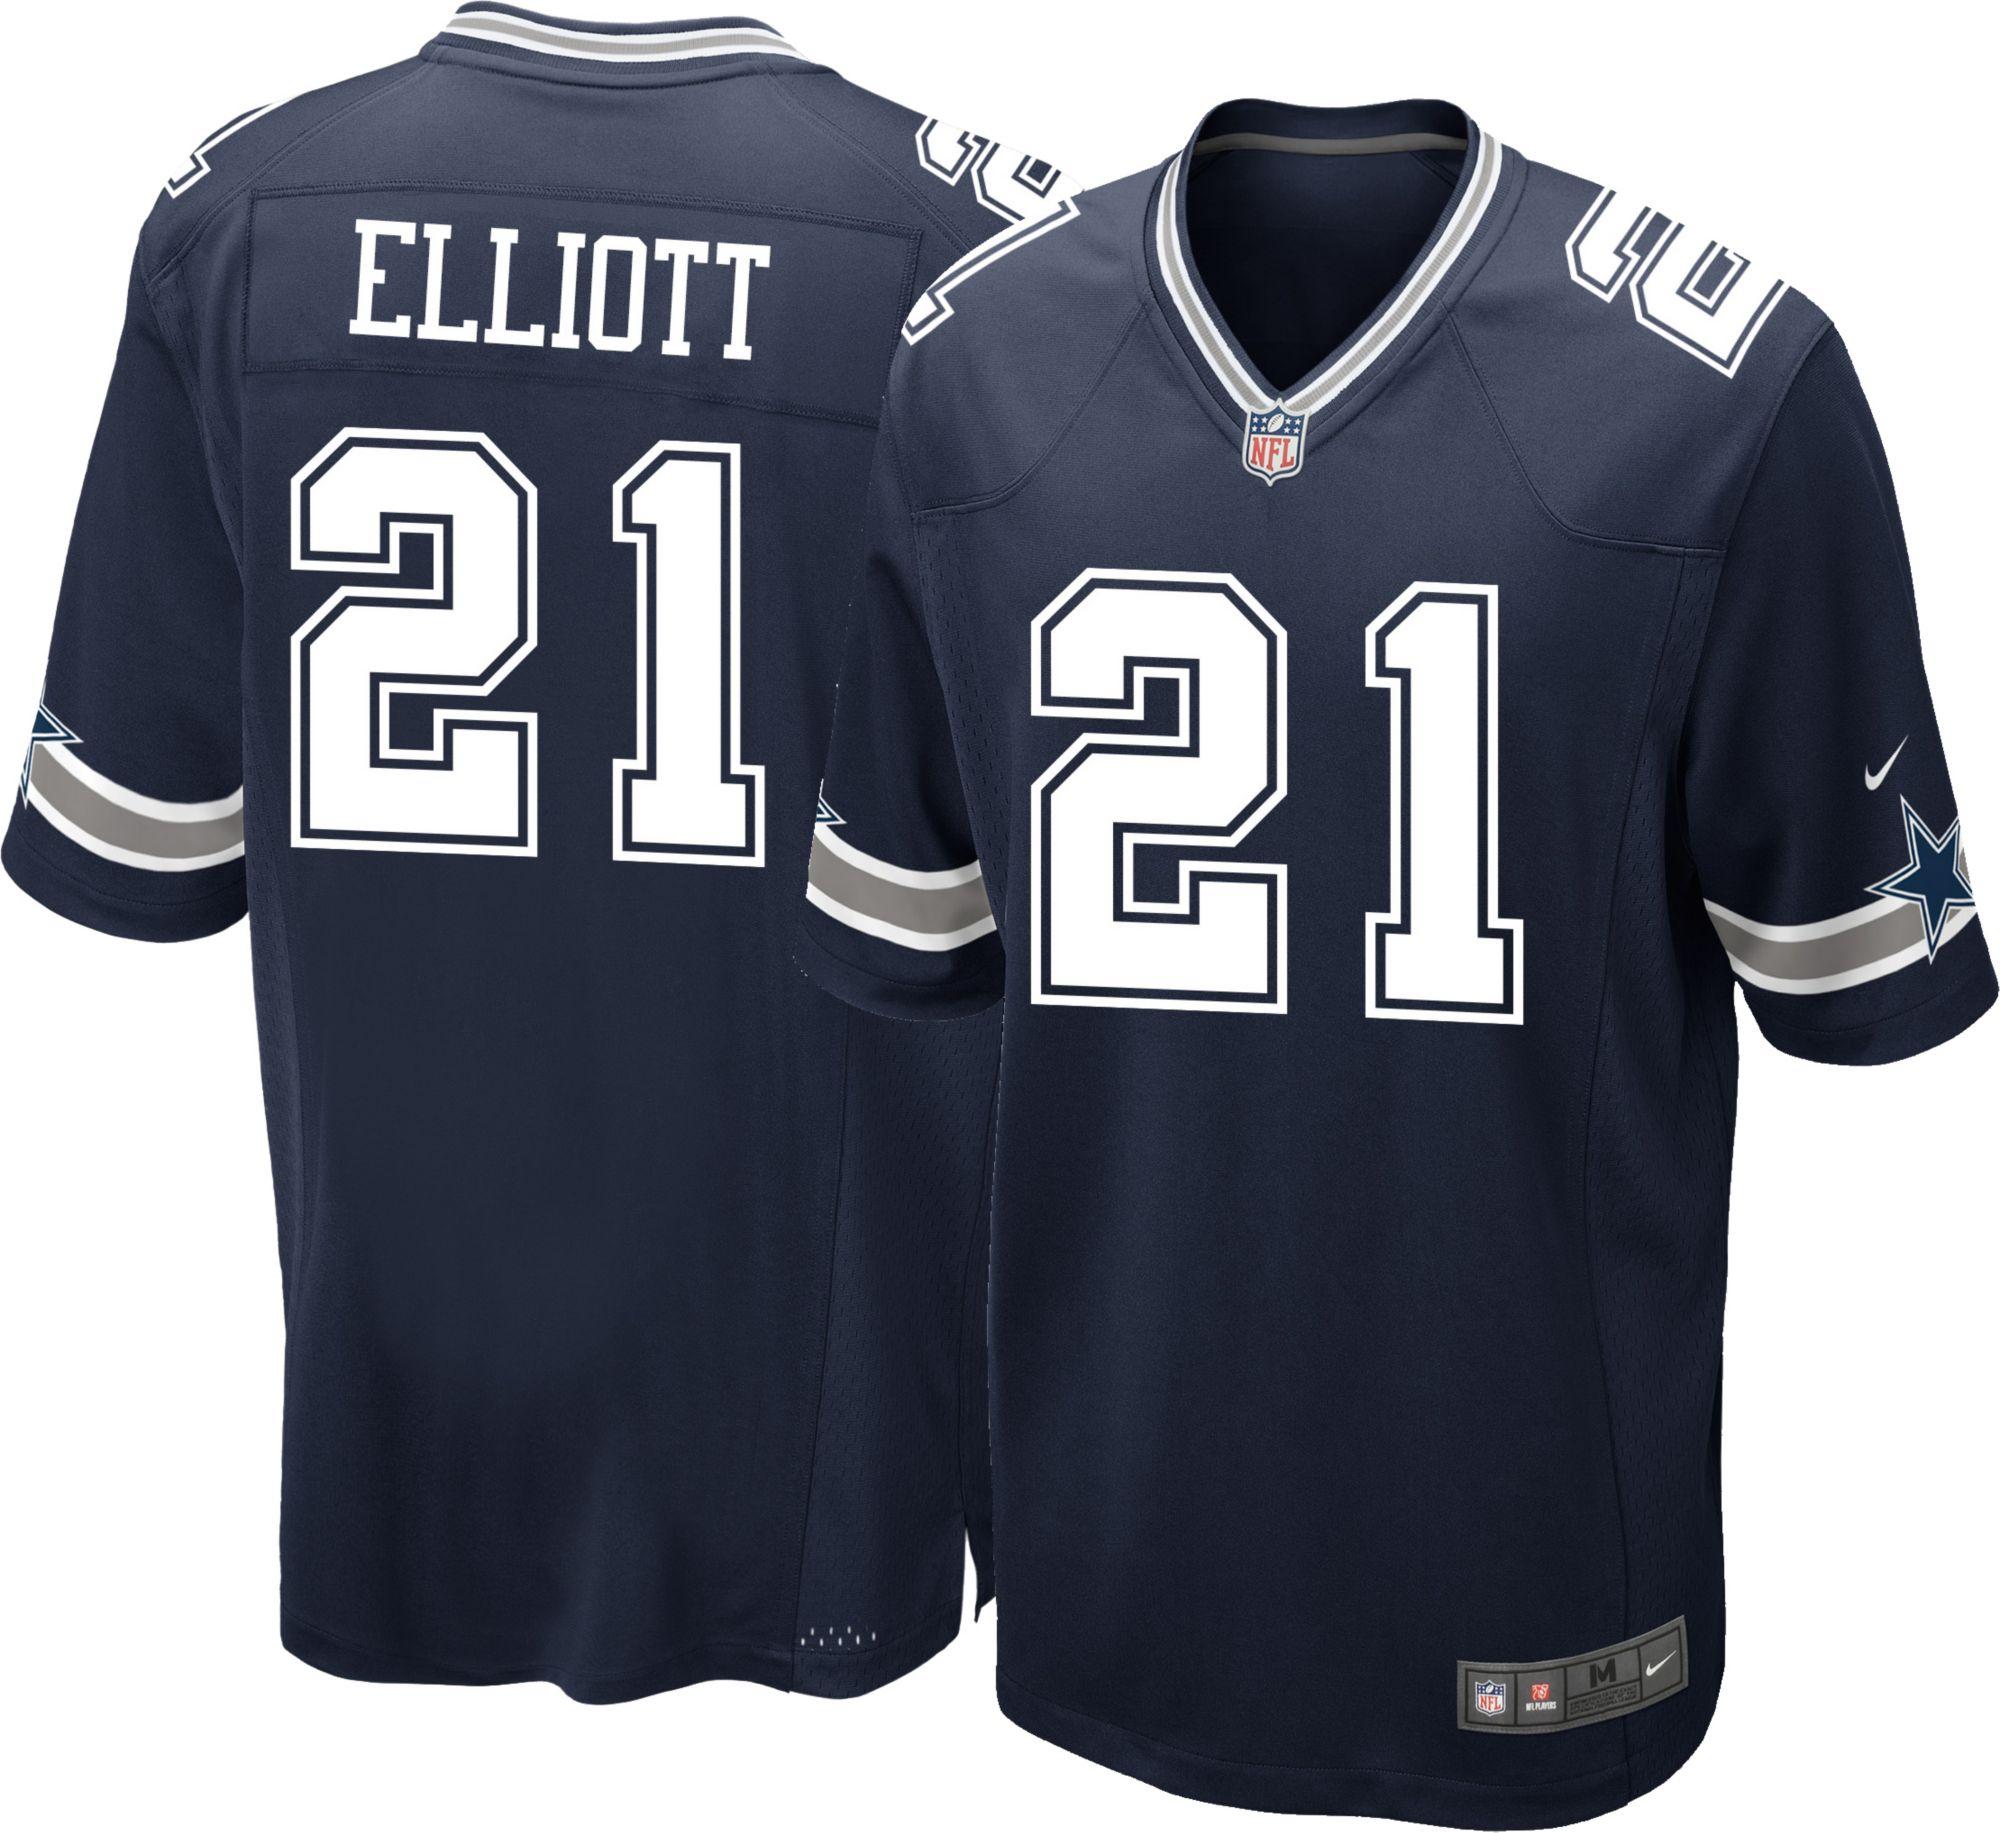 017e948d166 ... Product Image · Nike Mens Home Game Jersey Dallas Cowboys Ezekiel  Elliott 21 Blue Tyron Smith ...